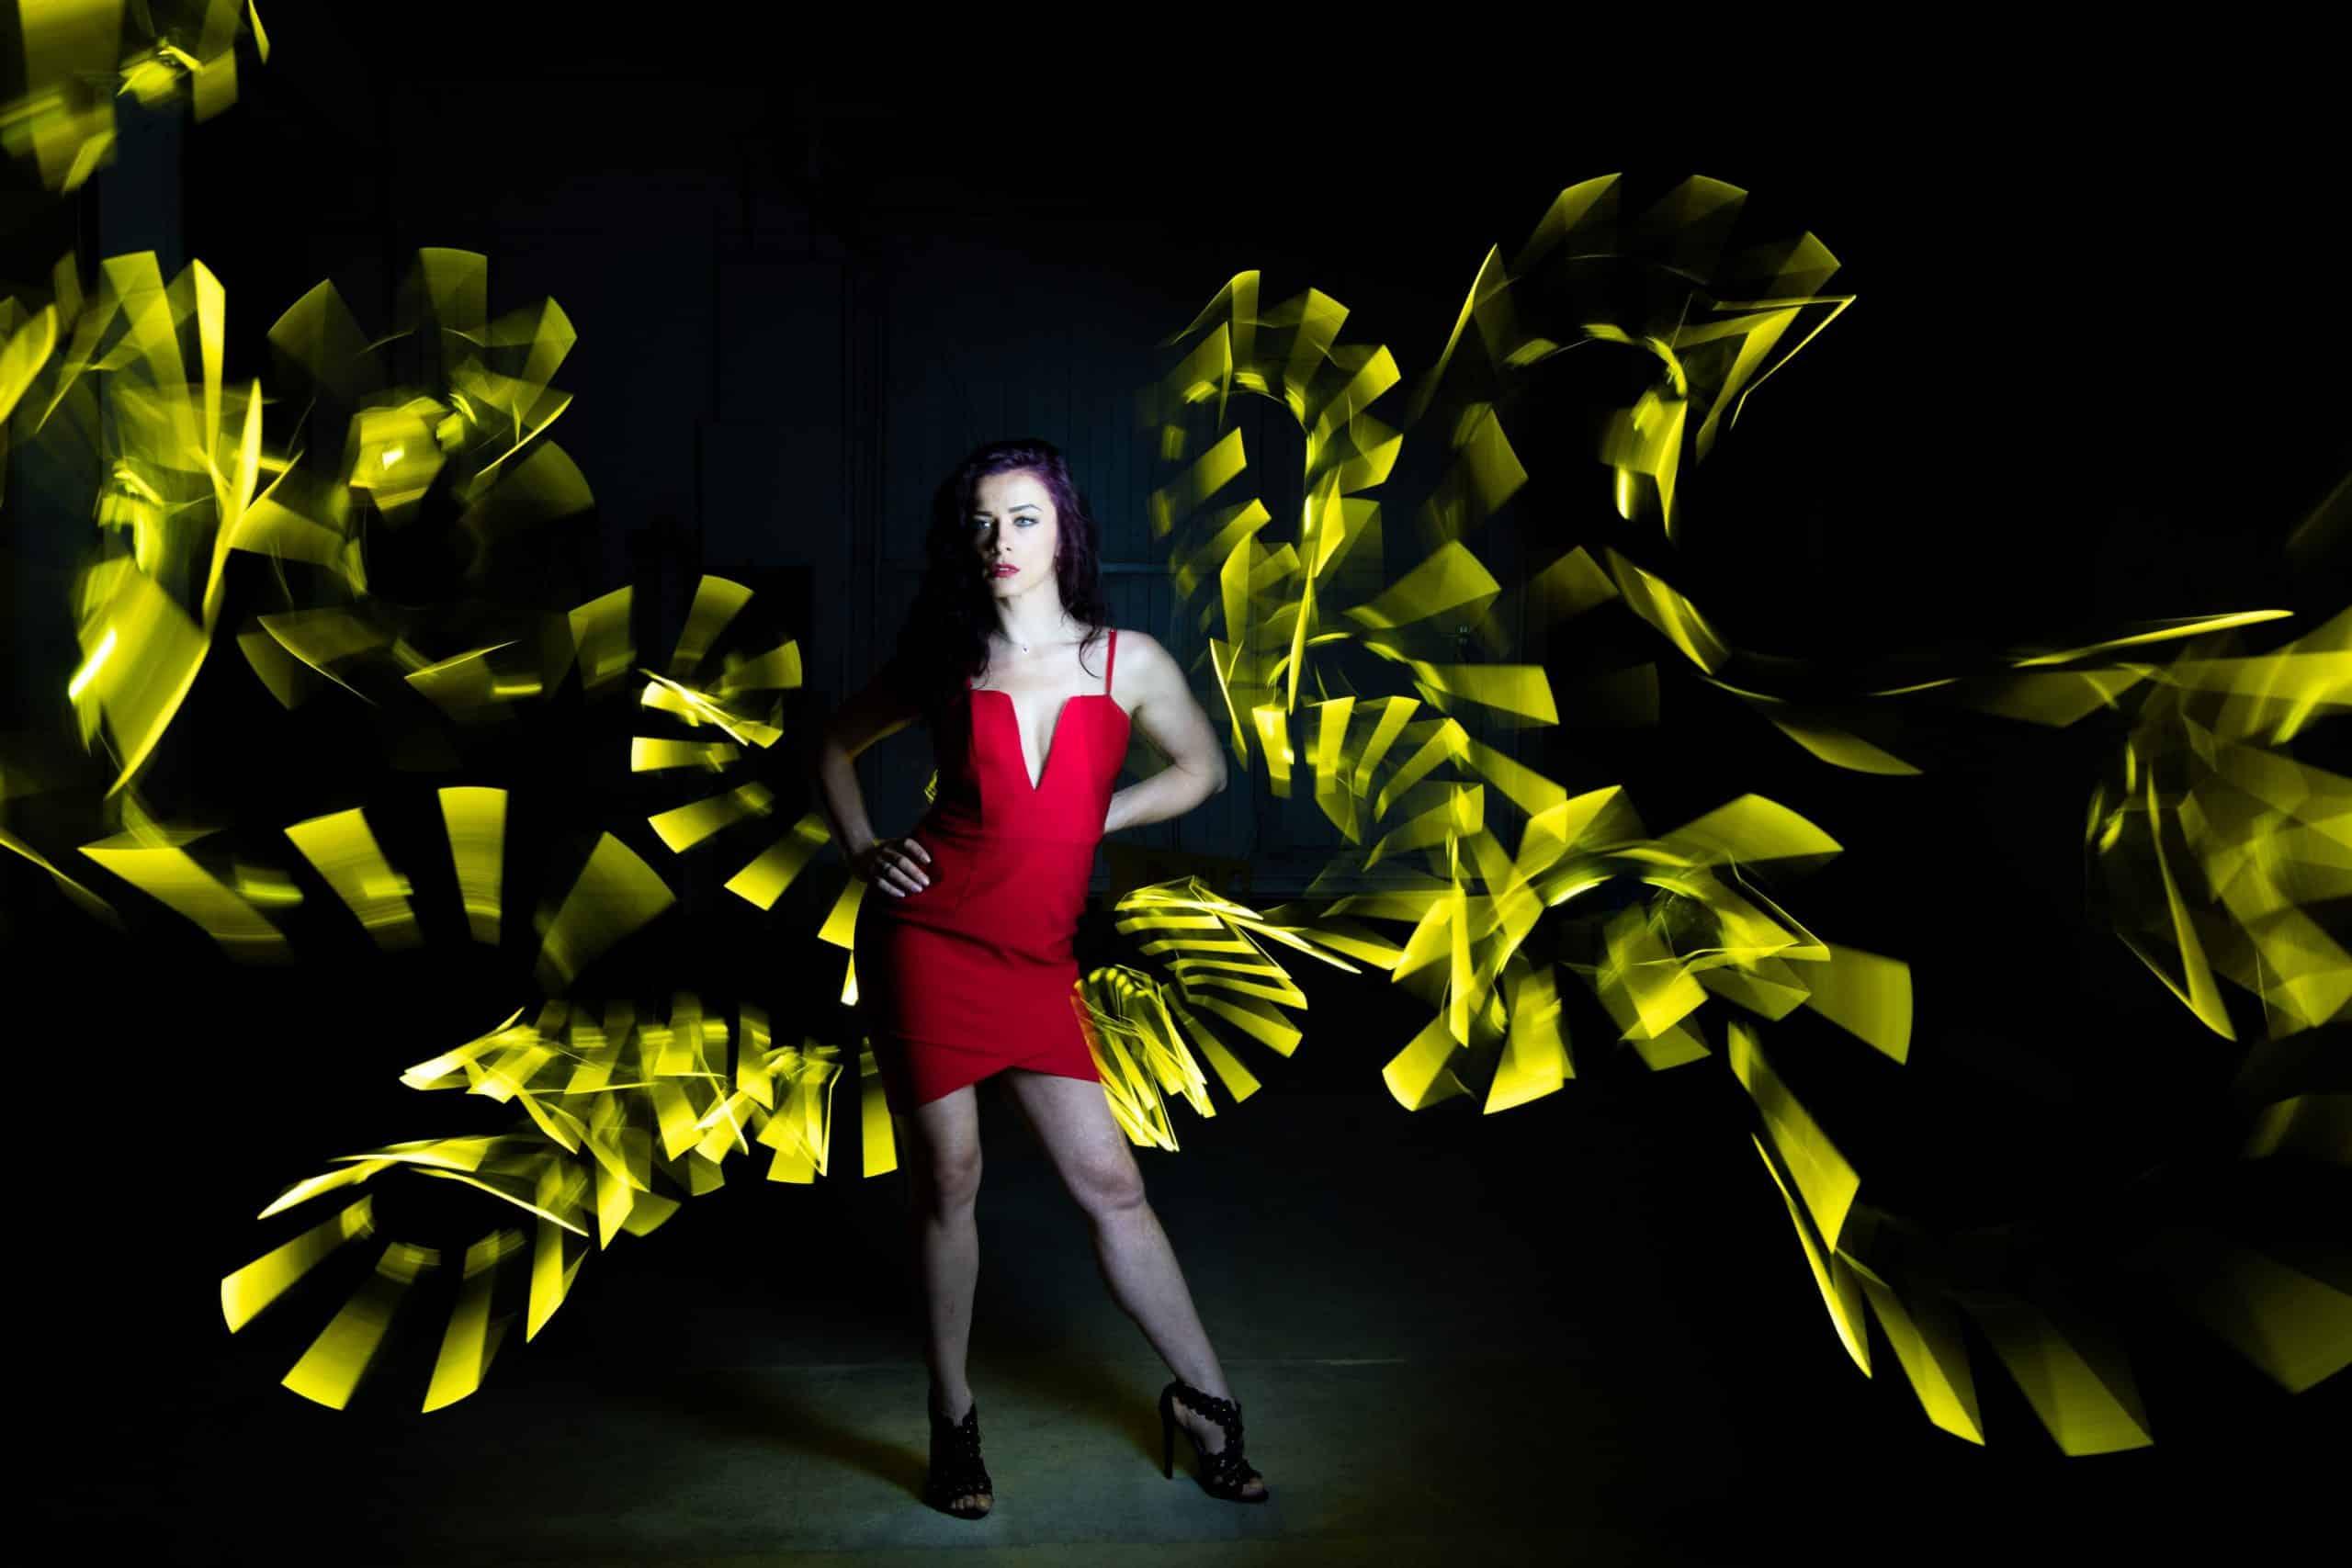 Lightpainting, Mahlen mit Licht, Fotoshooting